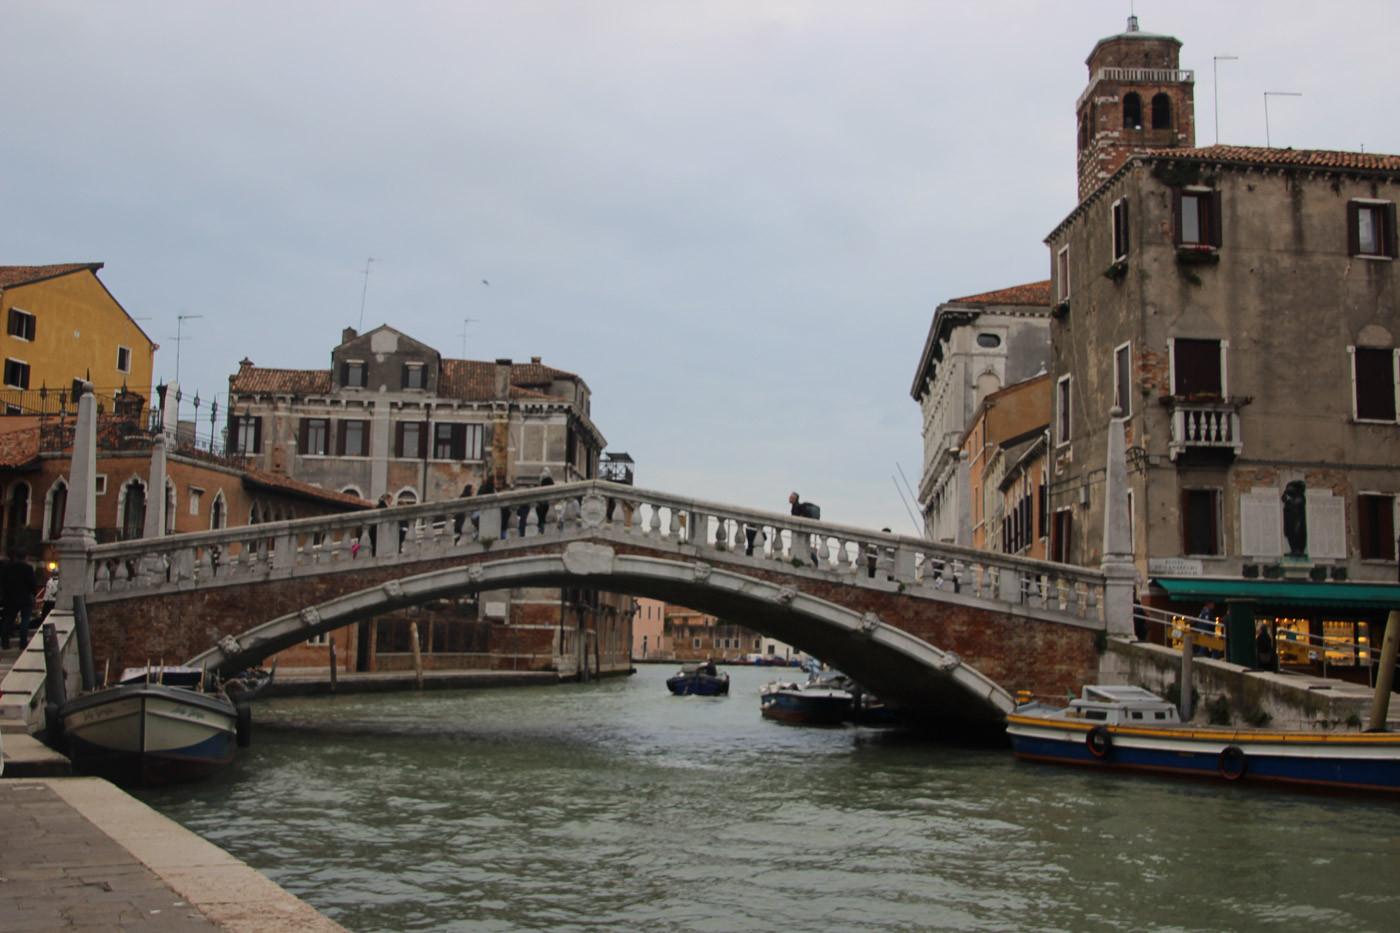 Puente delle Guglie